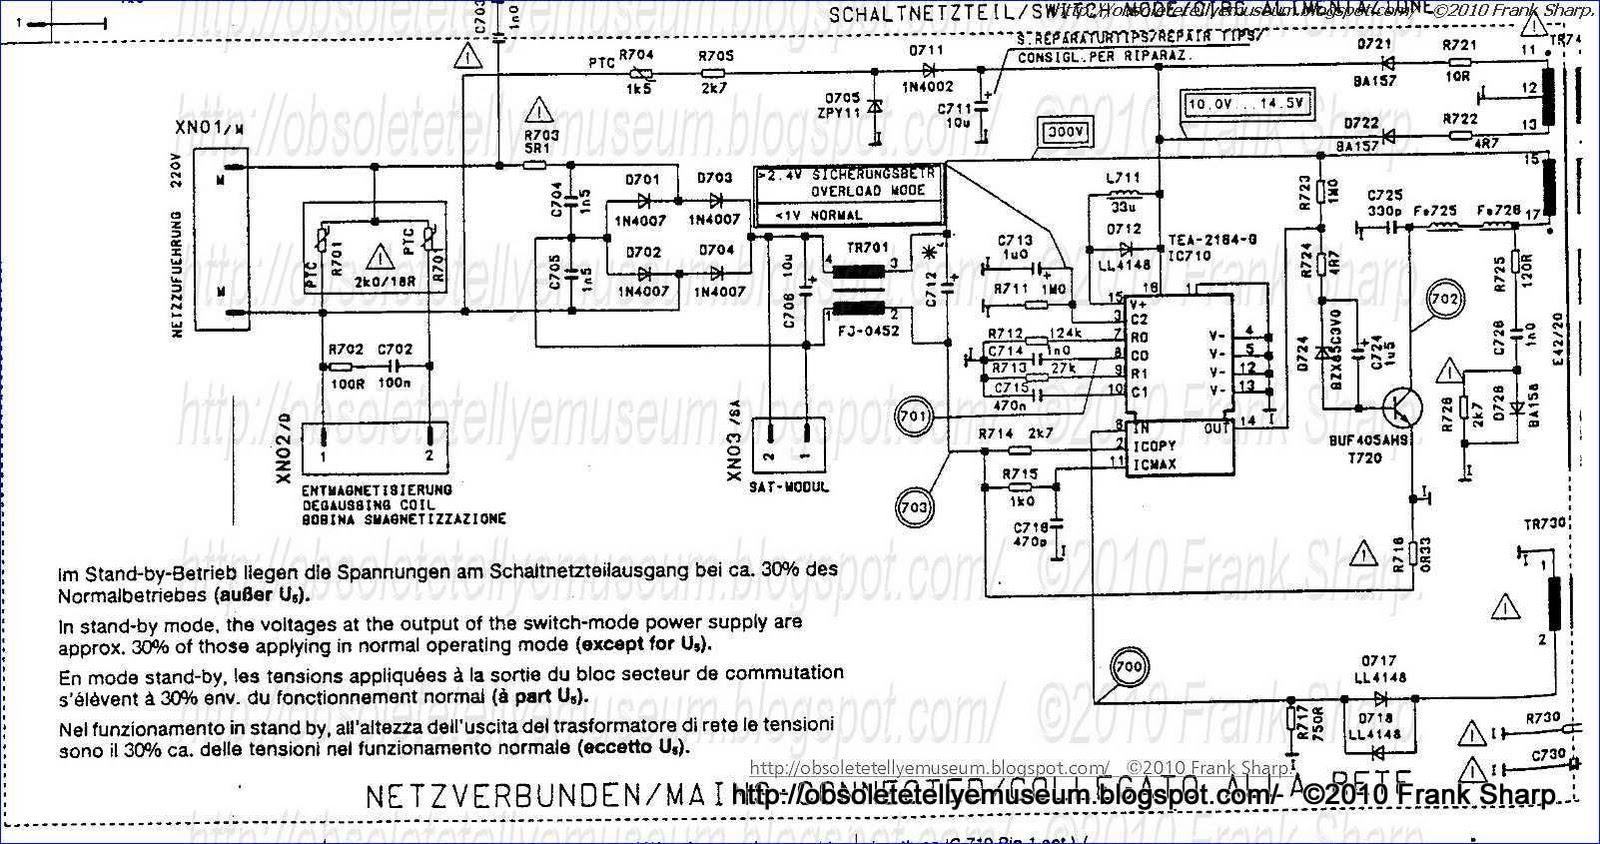 Obsolete Technology Tellye !: ITT NOKIA 7163 VT Chassis